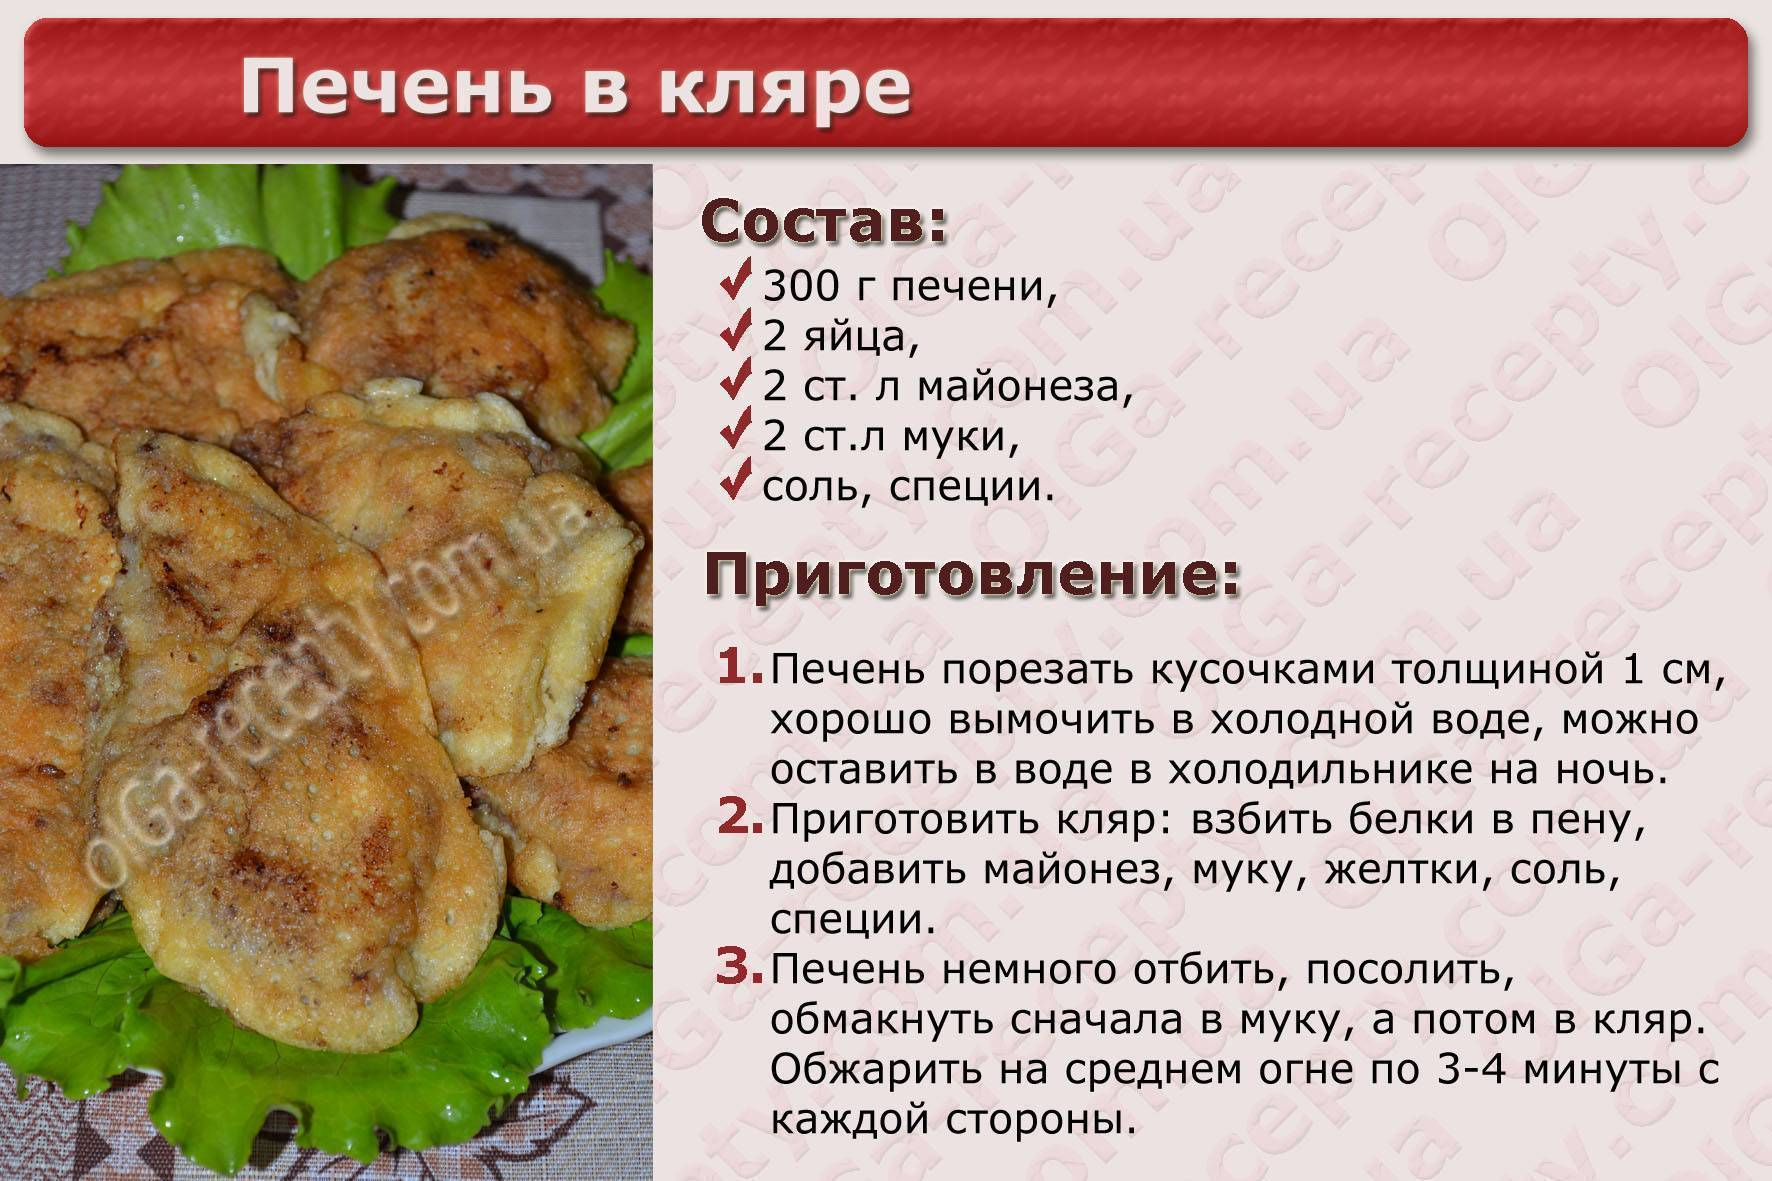 Блюда из налима: 3 рецепта с фото. как приготовить налима?